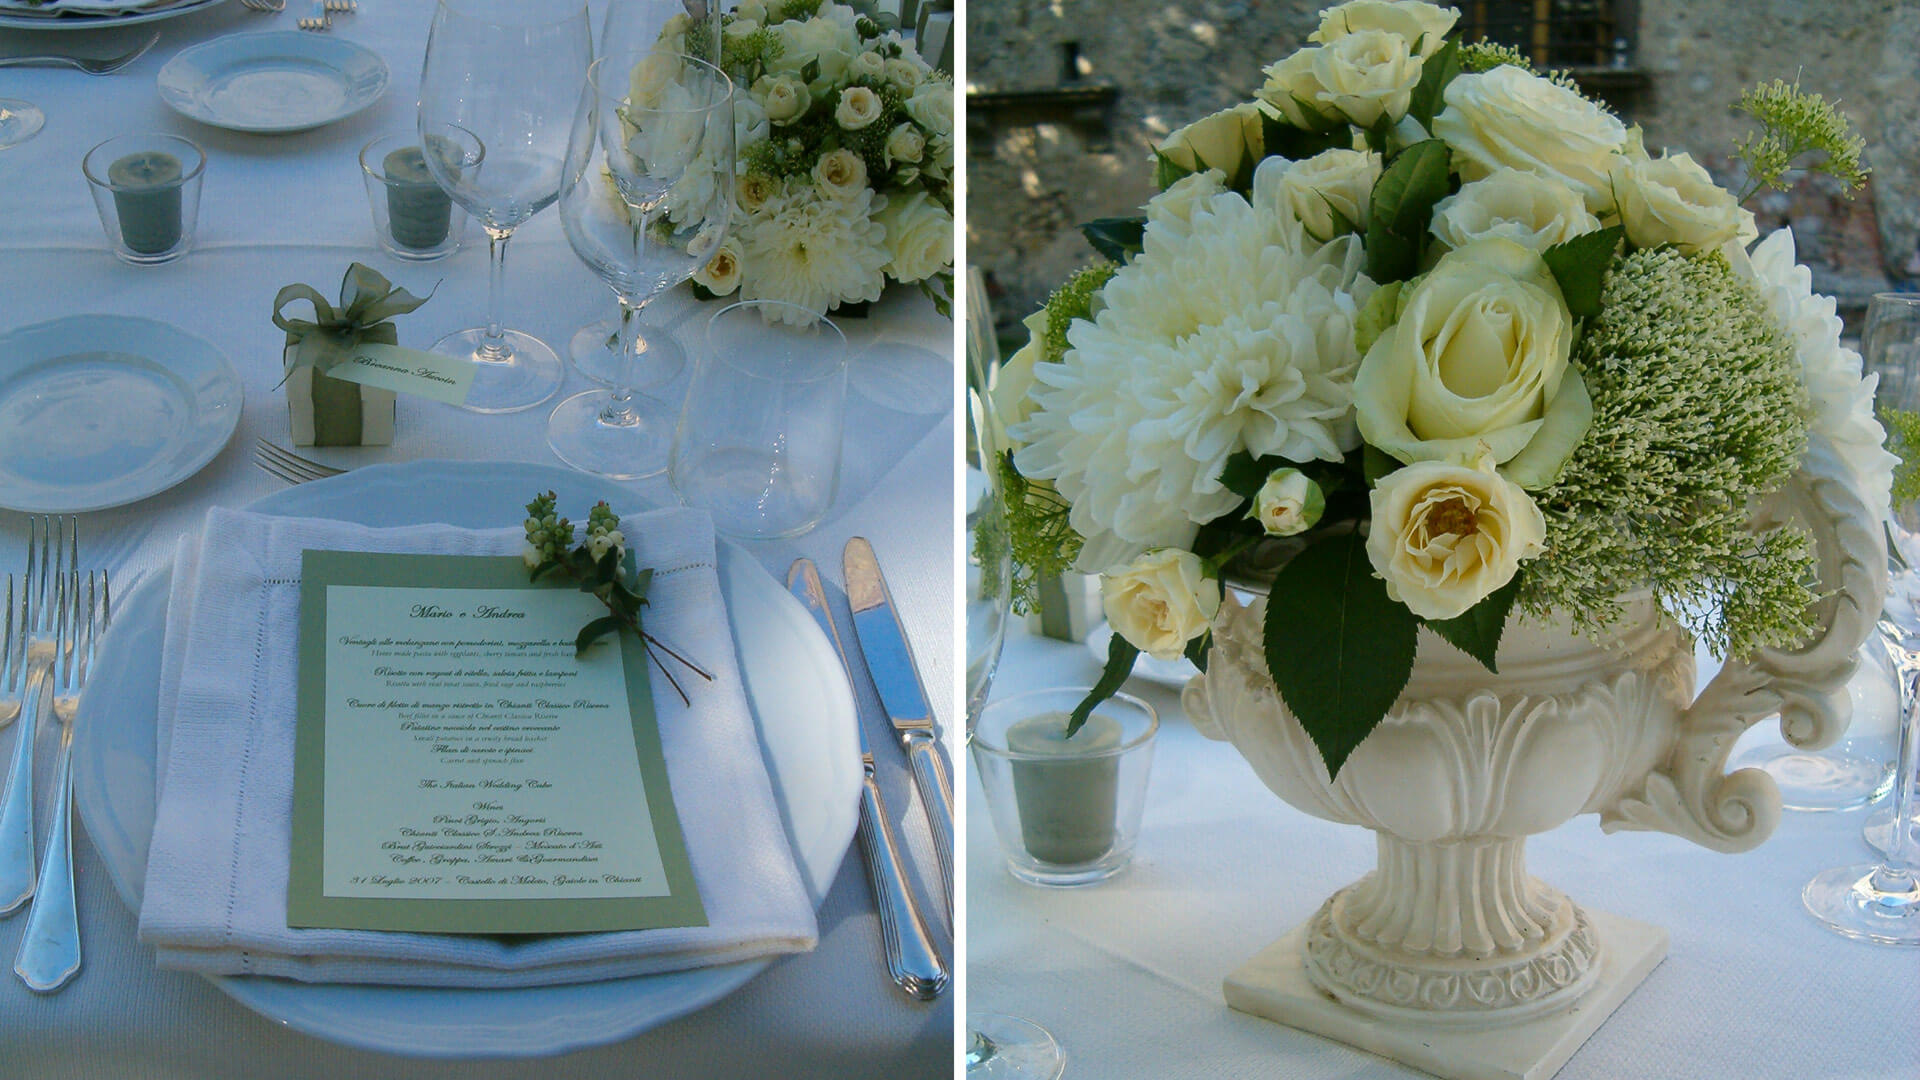 Bianco_essenziale_Wedding_Fiorile_firenze_3